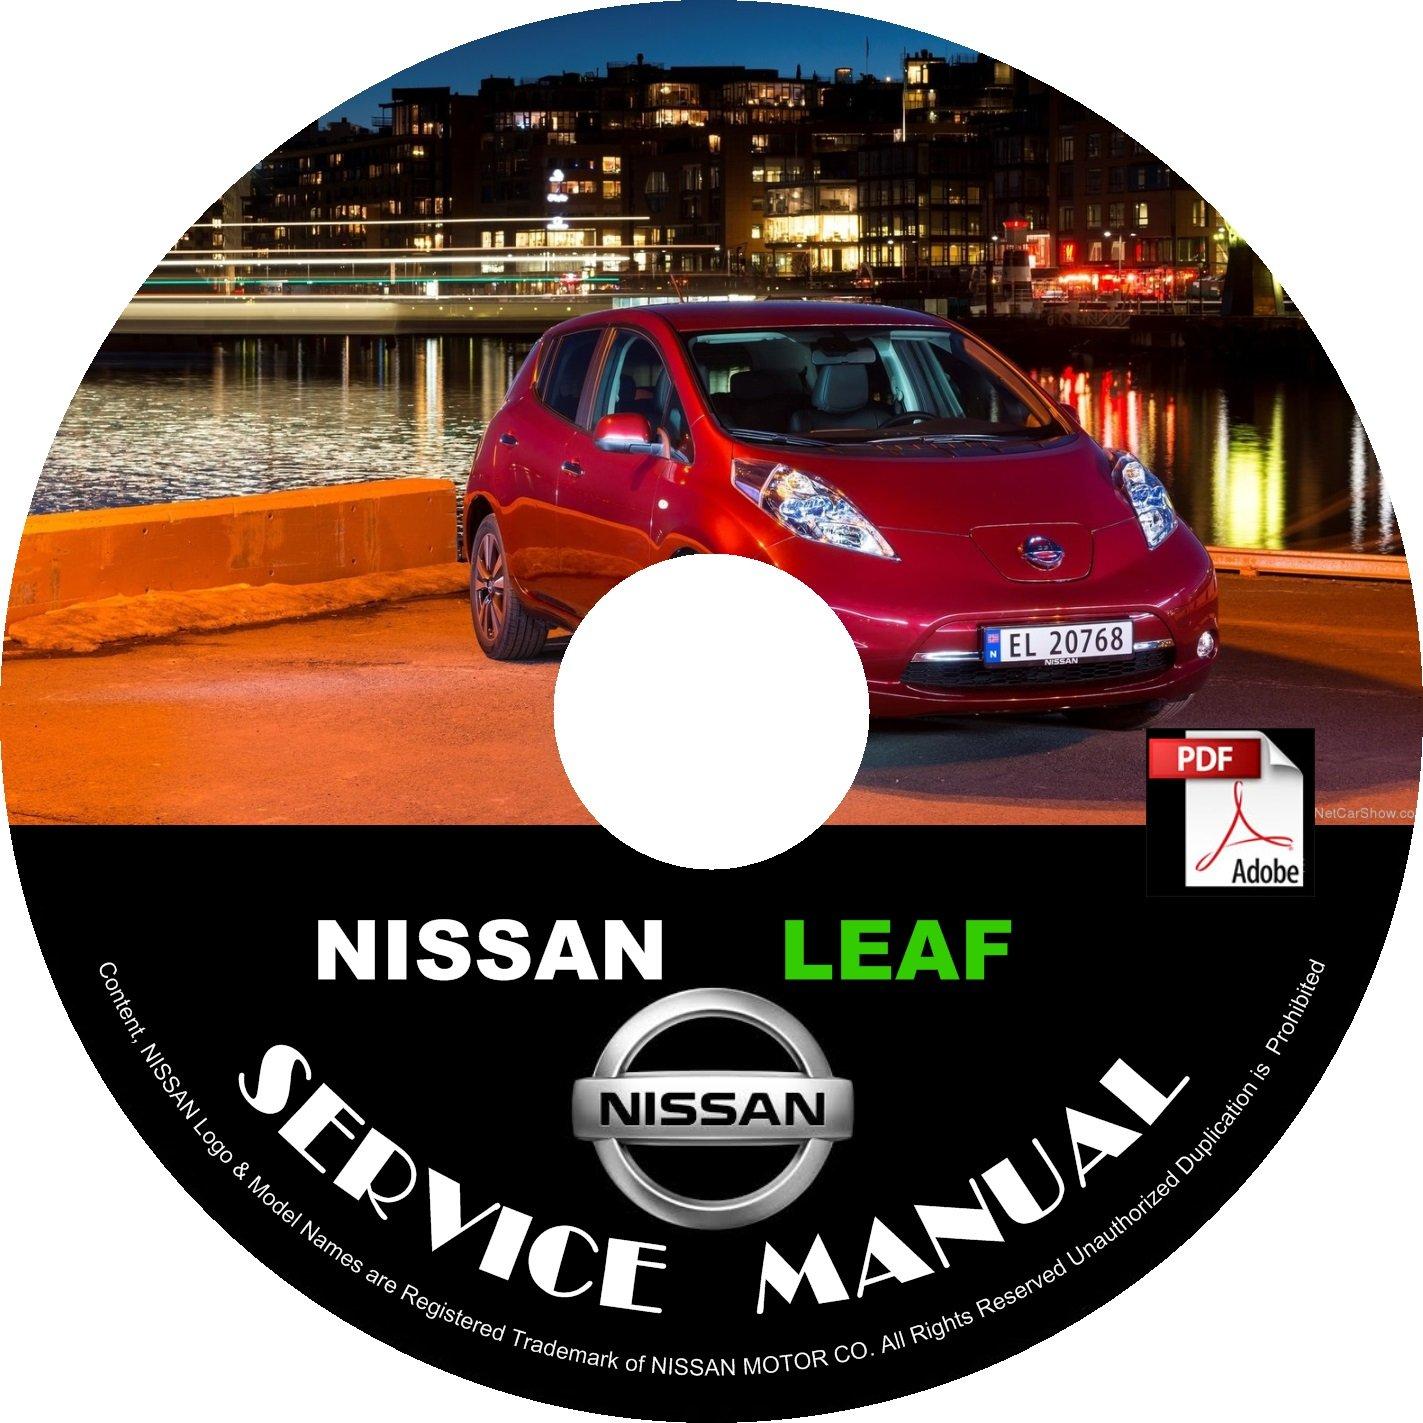 2013 Nissan Leaf Factory Service Repair Shop Manual on CD Fix Repair Rebuild Workshop Guide